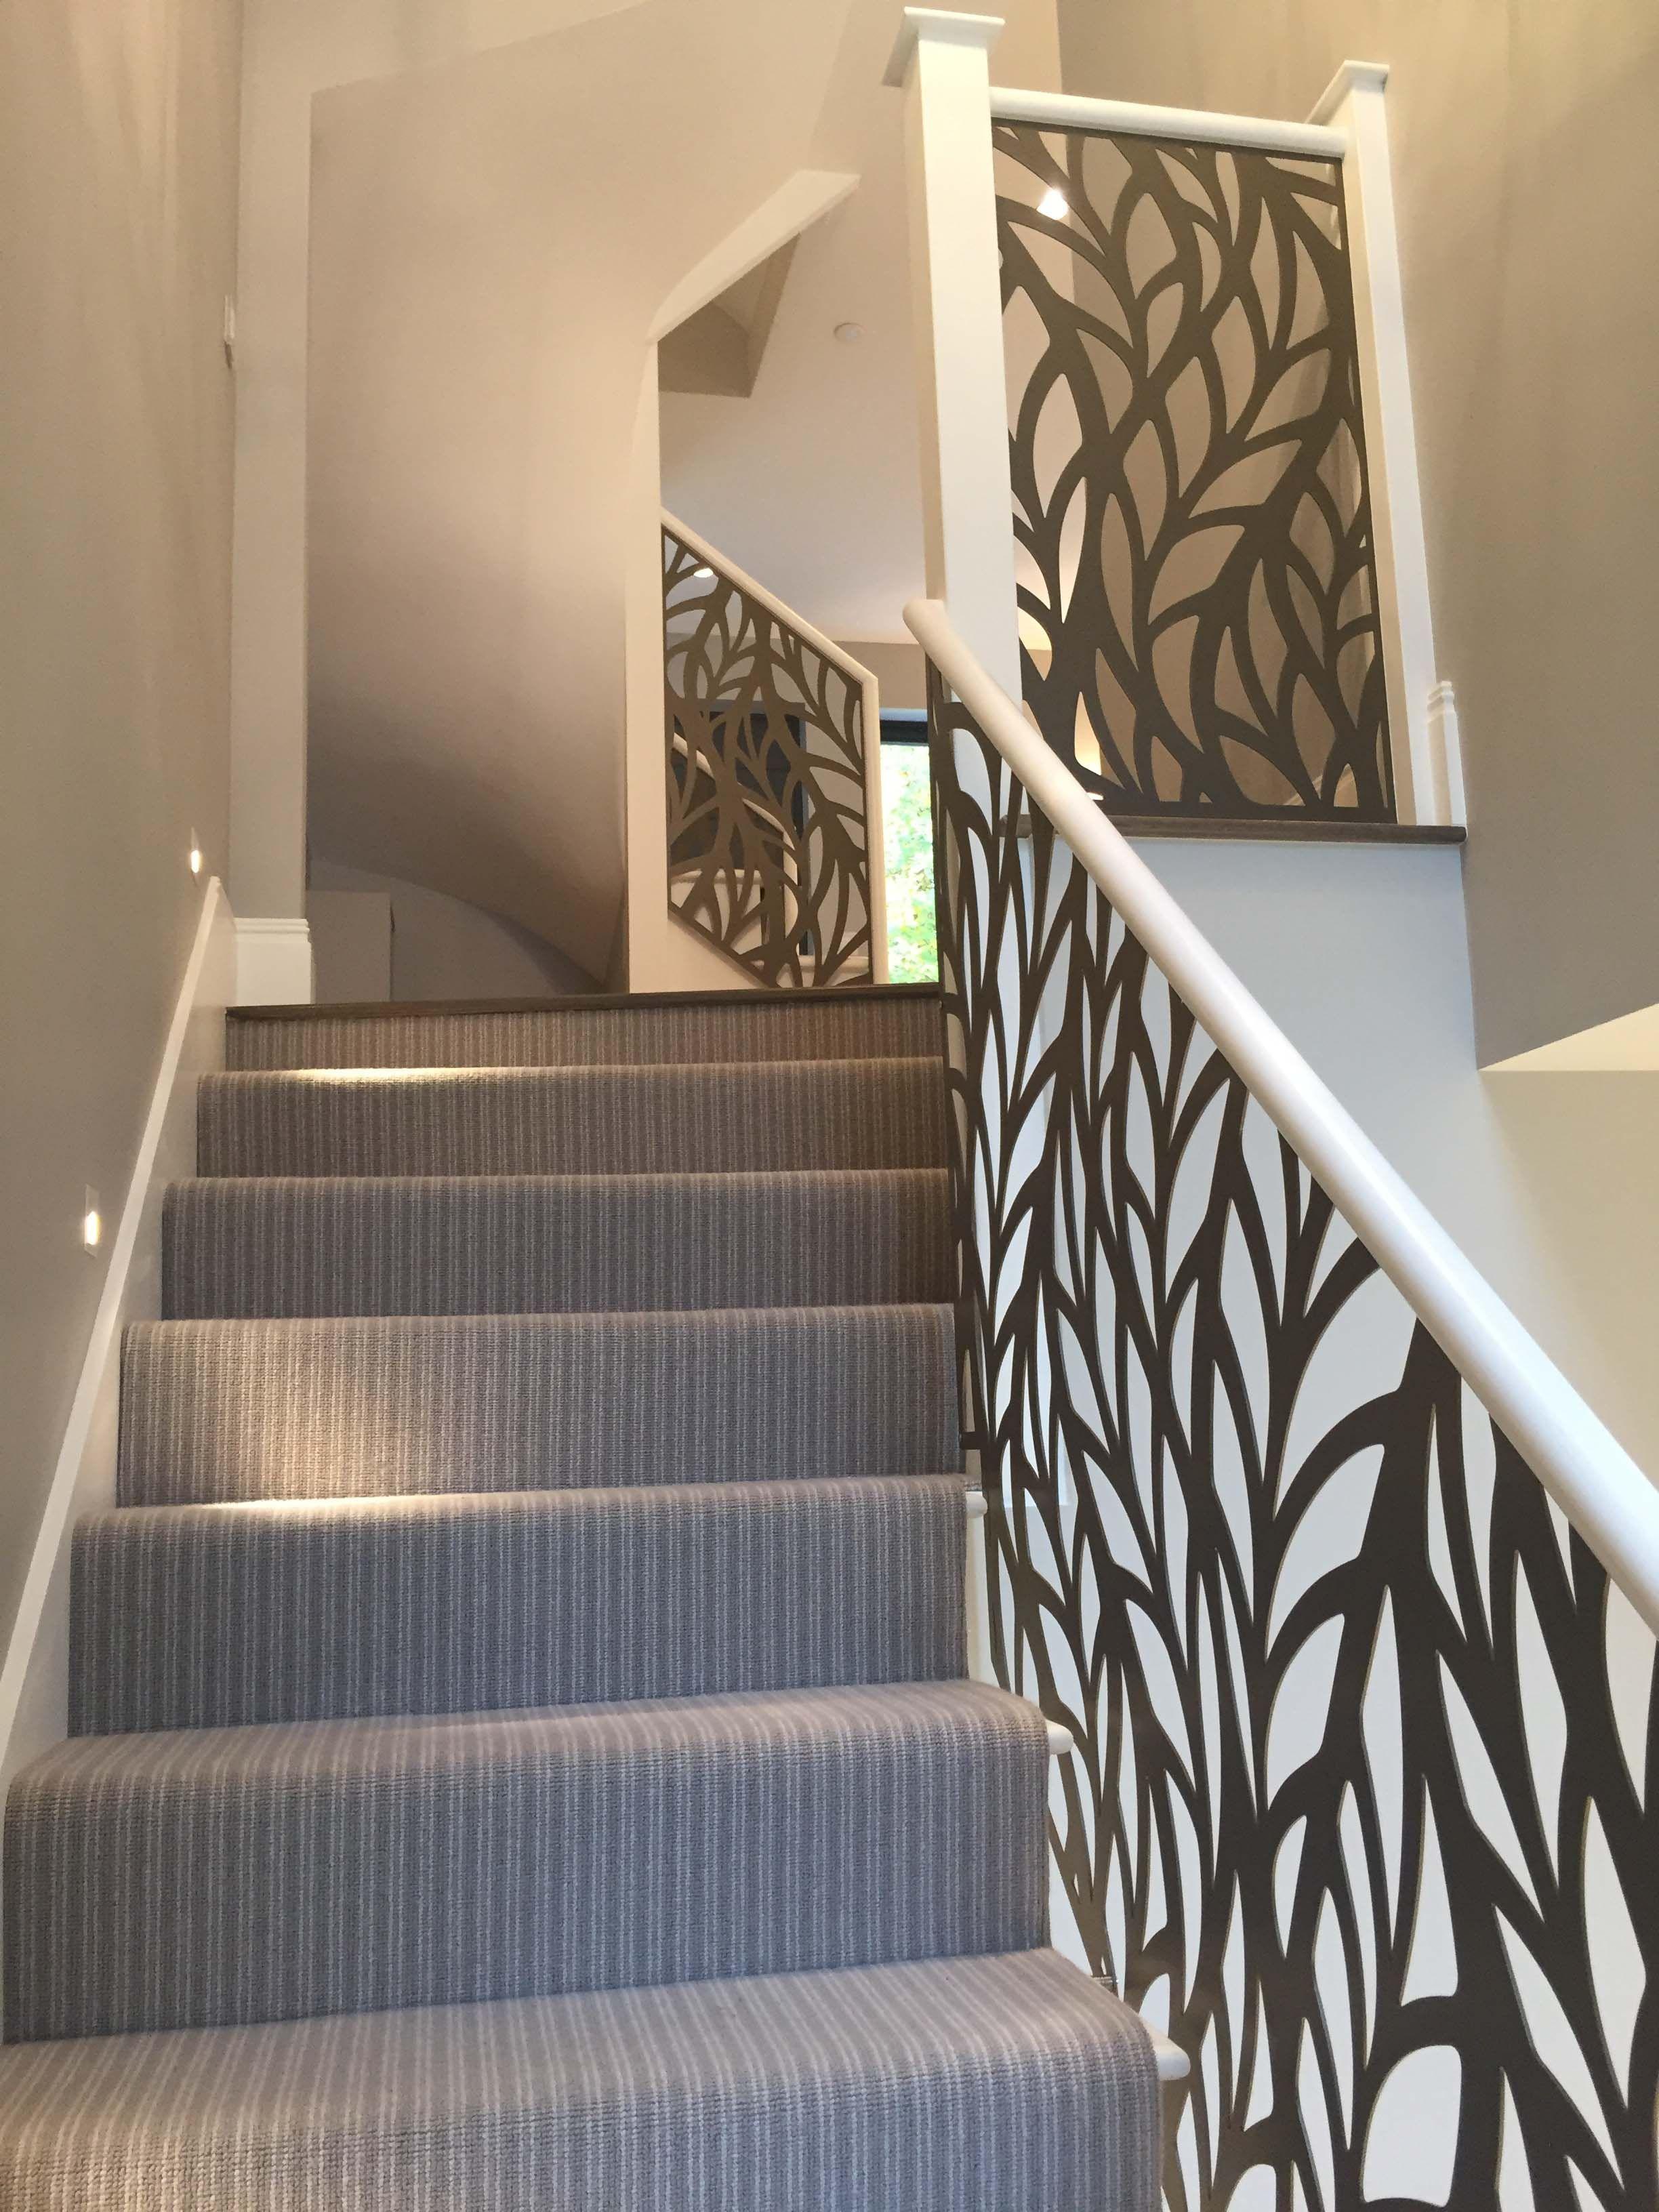 Balcony Design London: Laser Cut Balustrade Infill